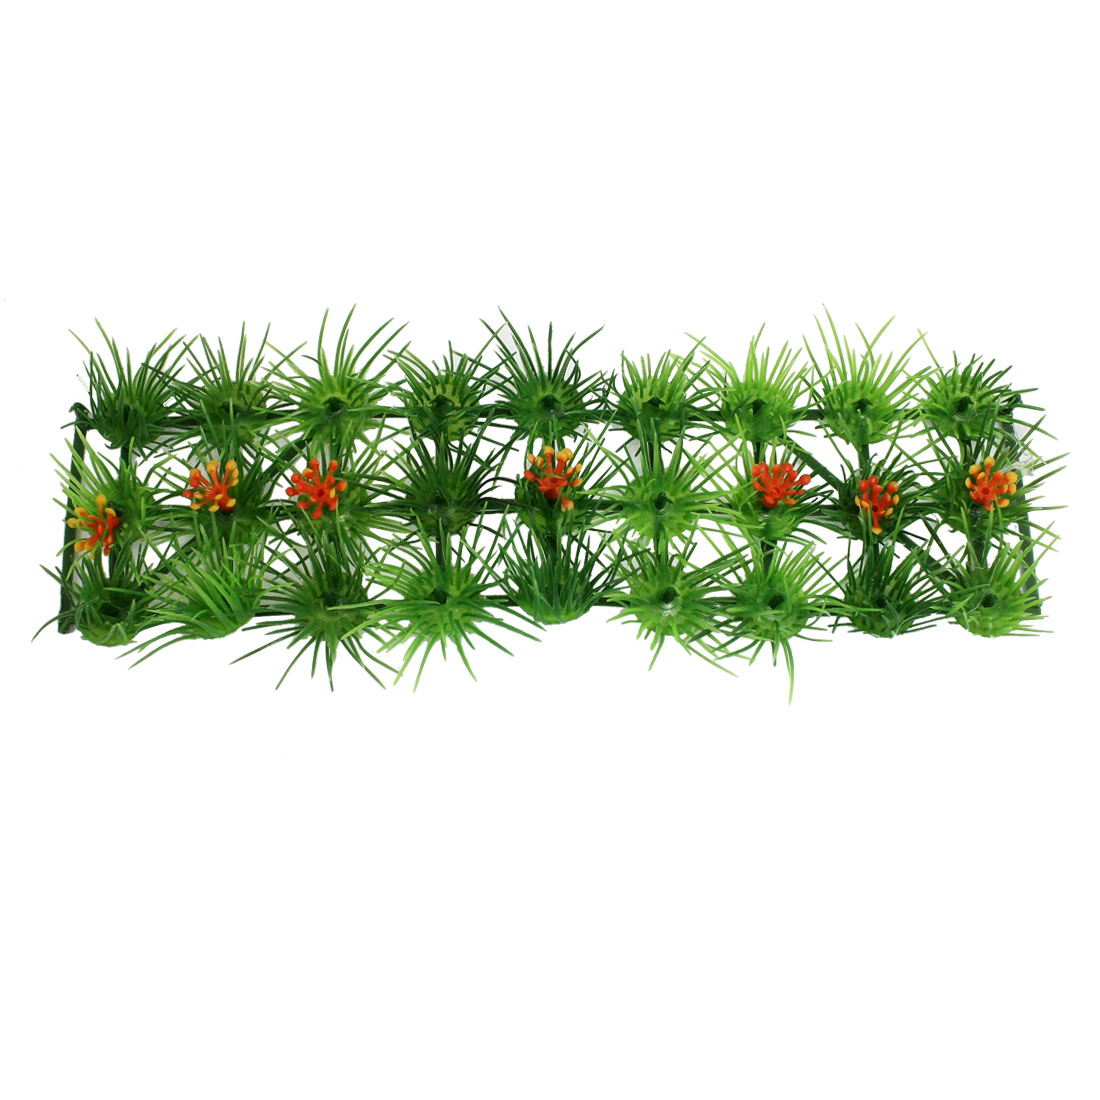 "9"" x 2.7"" Square Strip Design Fish Tank Aquarium Water Plastic Leaves Grass Green"